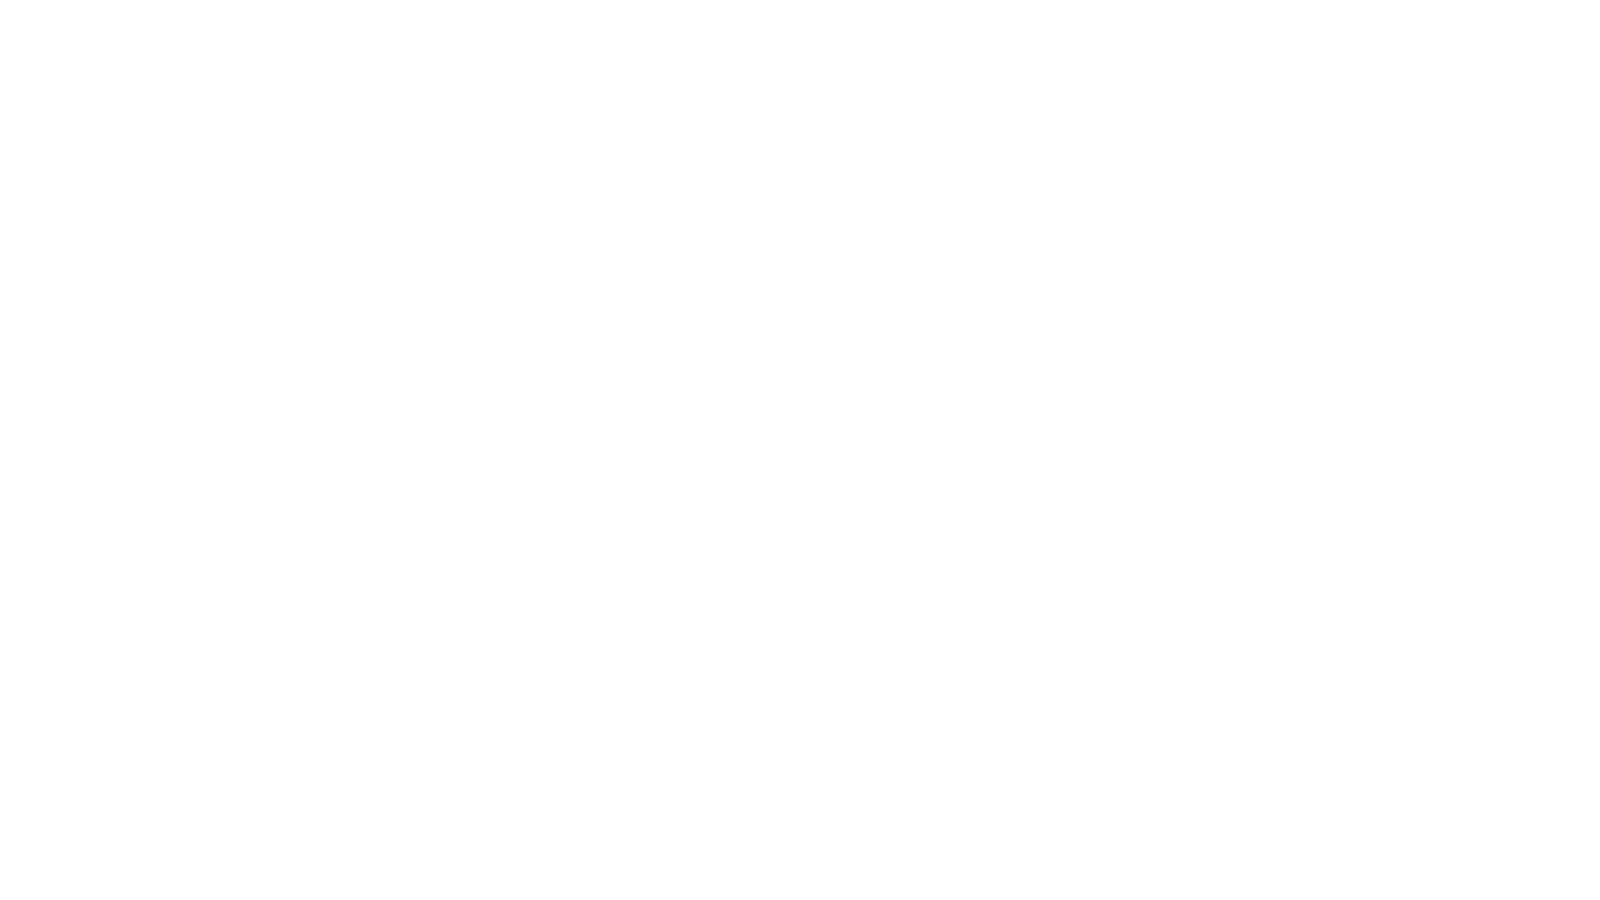 Daru, seorang pemuda di pesisir Rembang Jawa Tengah mengalami berbagai pergolakan dalam menjalani kehidupannya sebagai nelayan. Modal yang minim dengan penghasilan yang paspasan menjadikannya bimbang untuk tetap menjadi nelayan atau harus merantau ke kota besar sesuai harapan pacarnya, Asih.   Kedatangan Bella dari kota yang menawarkan modal kepada para nelayan sempat mengalami penolakan karena nelayan kapok dengan pinjaman modal yang menerapkan bunga pinjaman dan denda yang tinggi, hingga harus menghabiskan hasil tangkapan yang hanya di bayar murah.   Lalu, bisakah Bella mengambil hati Daru dari Asih dan para nelayan untuk memutuskan  'Akad'?